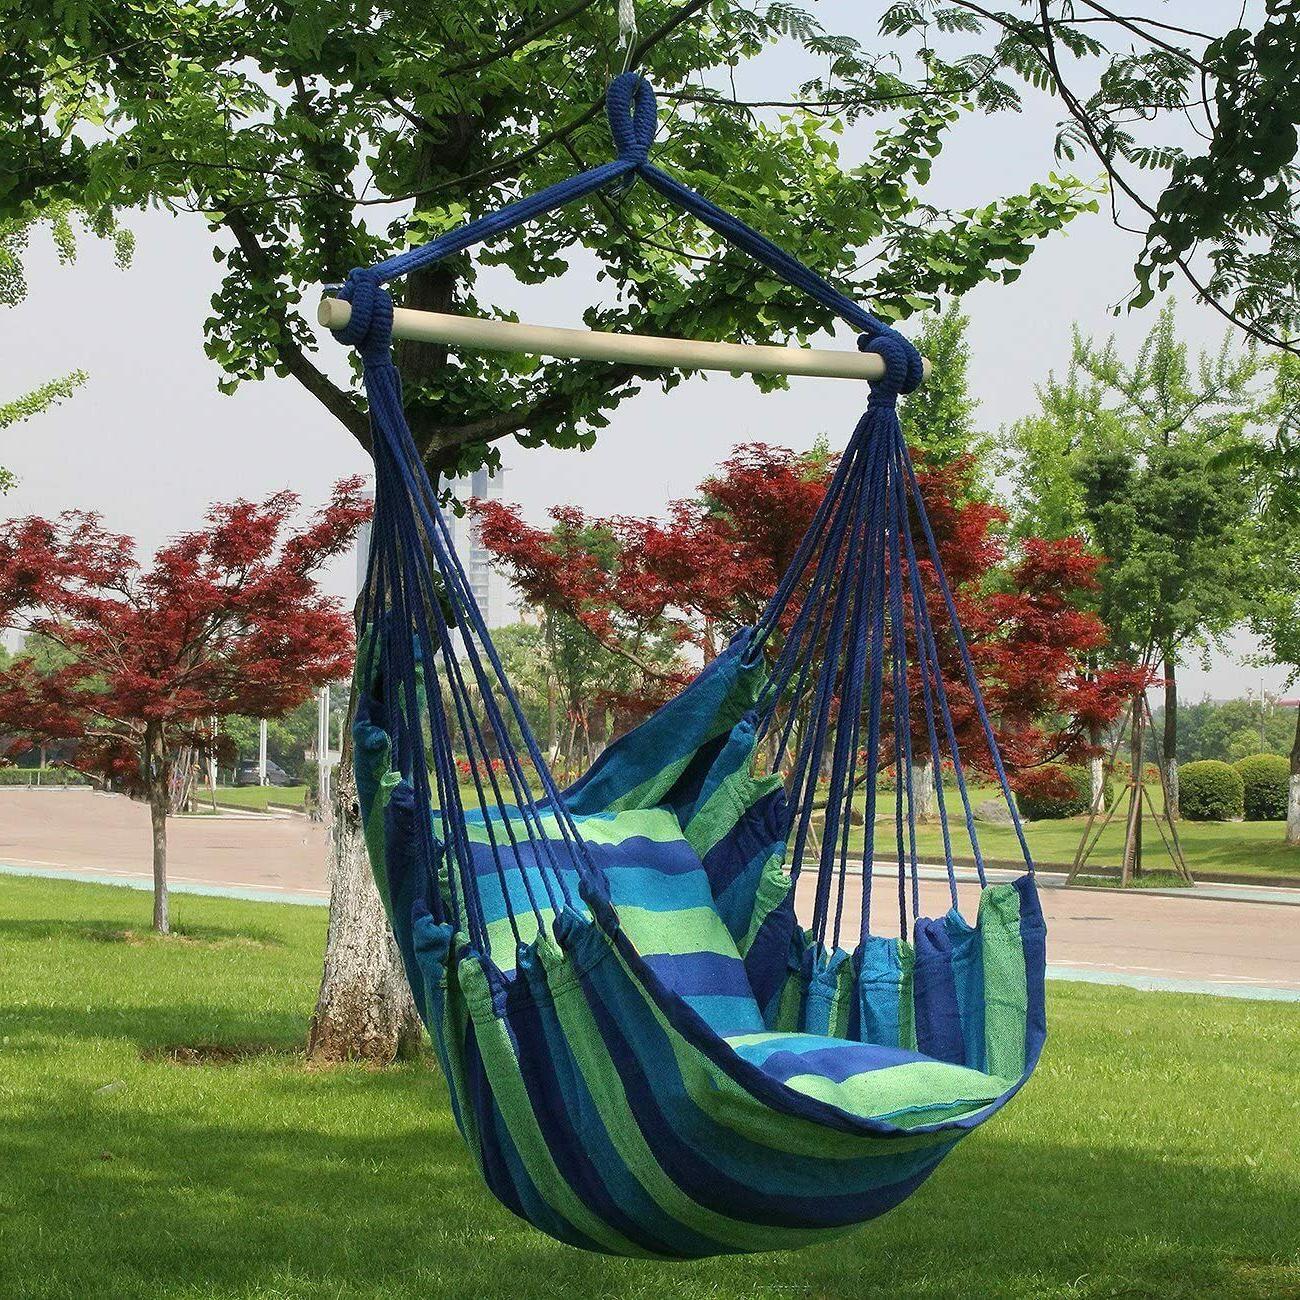 Sorbus Hanging or Outdoor Lbs